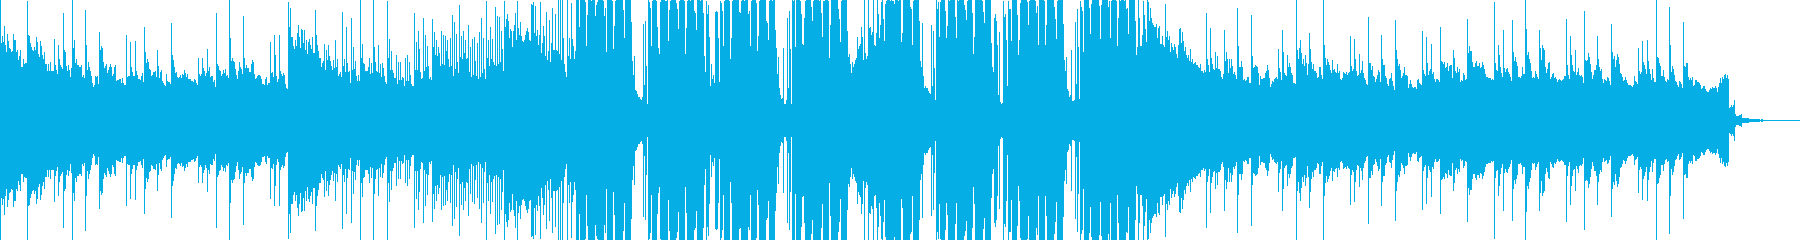 FutureBass3、洋楽、爽快、夏bの再生済みの波形